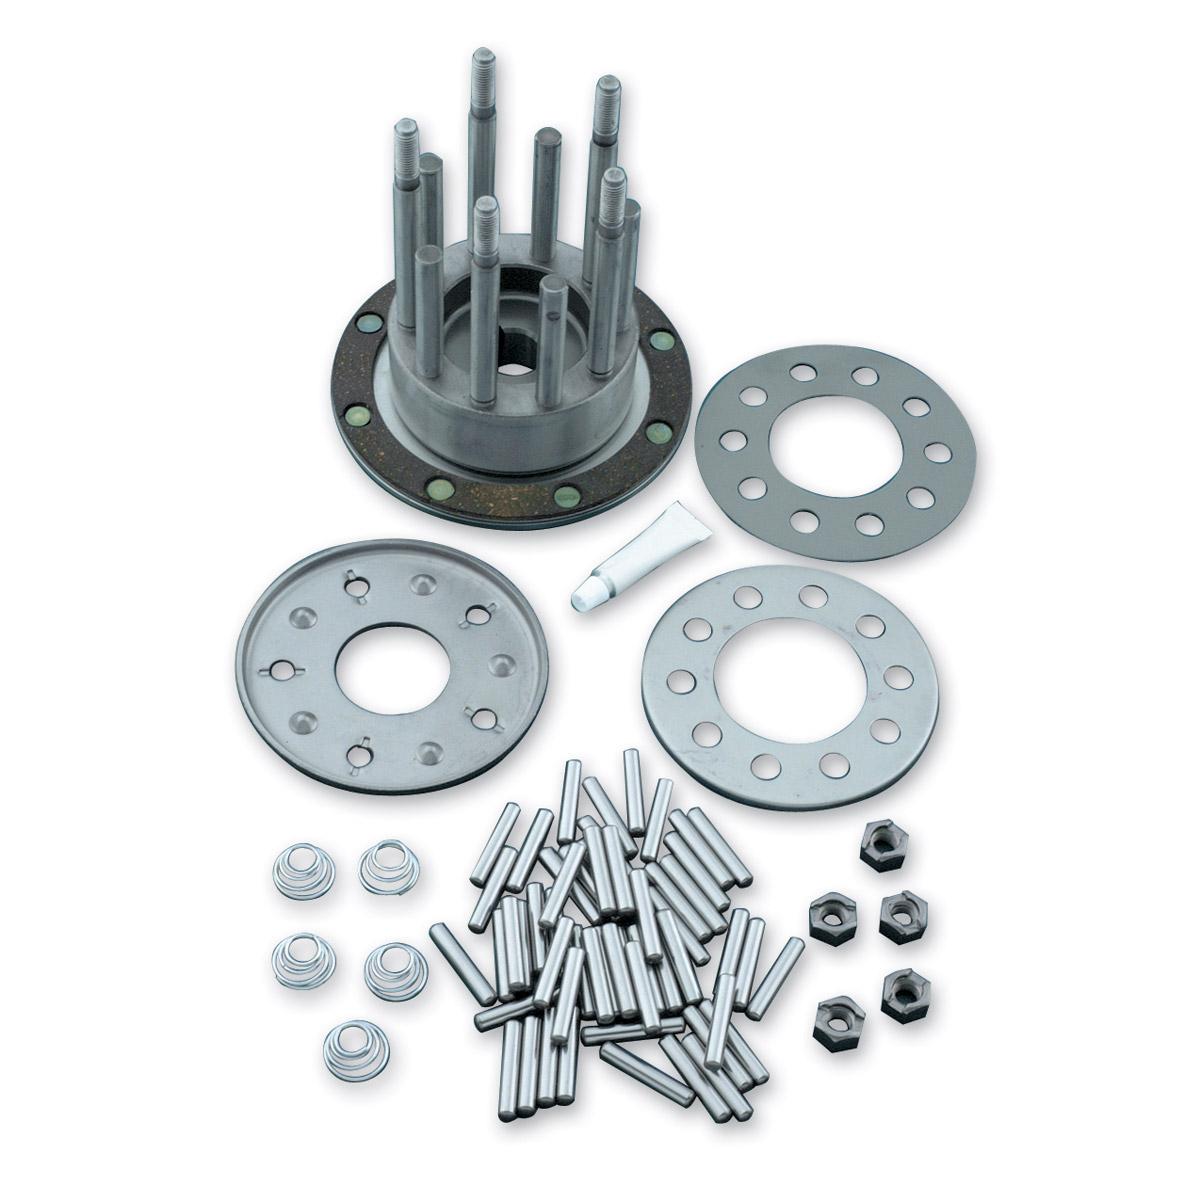 Clutch Hub 10-Stud Parts Kit for Harley Davidson by V-Twin